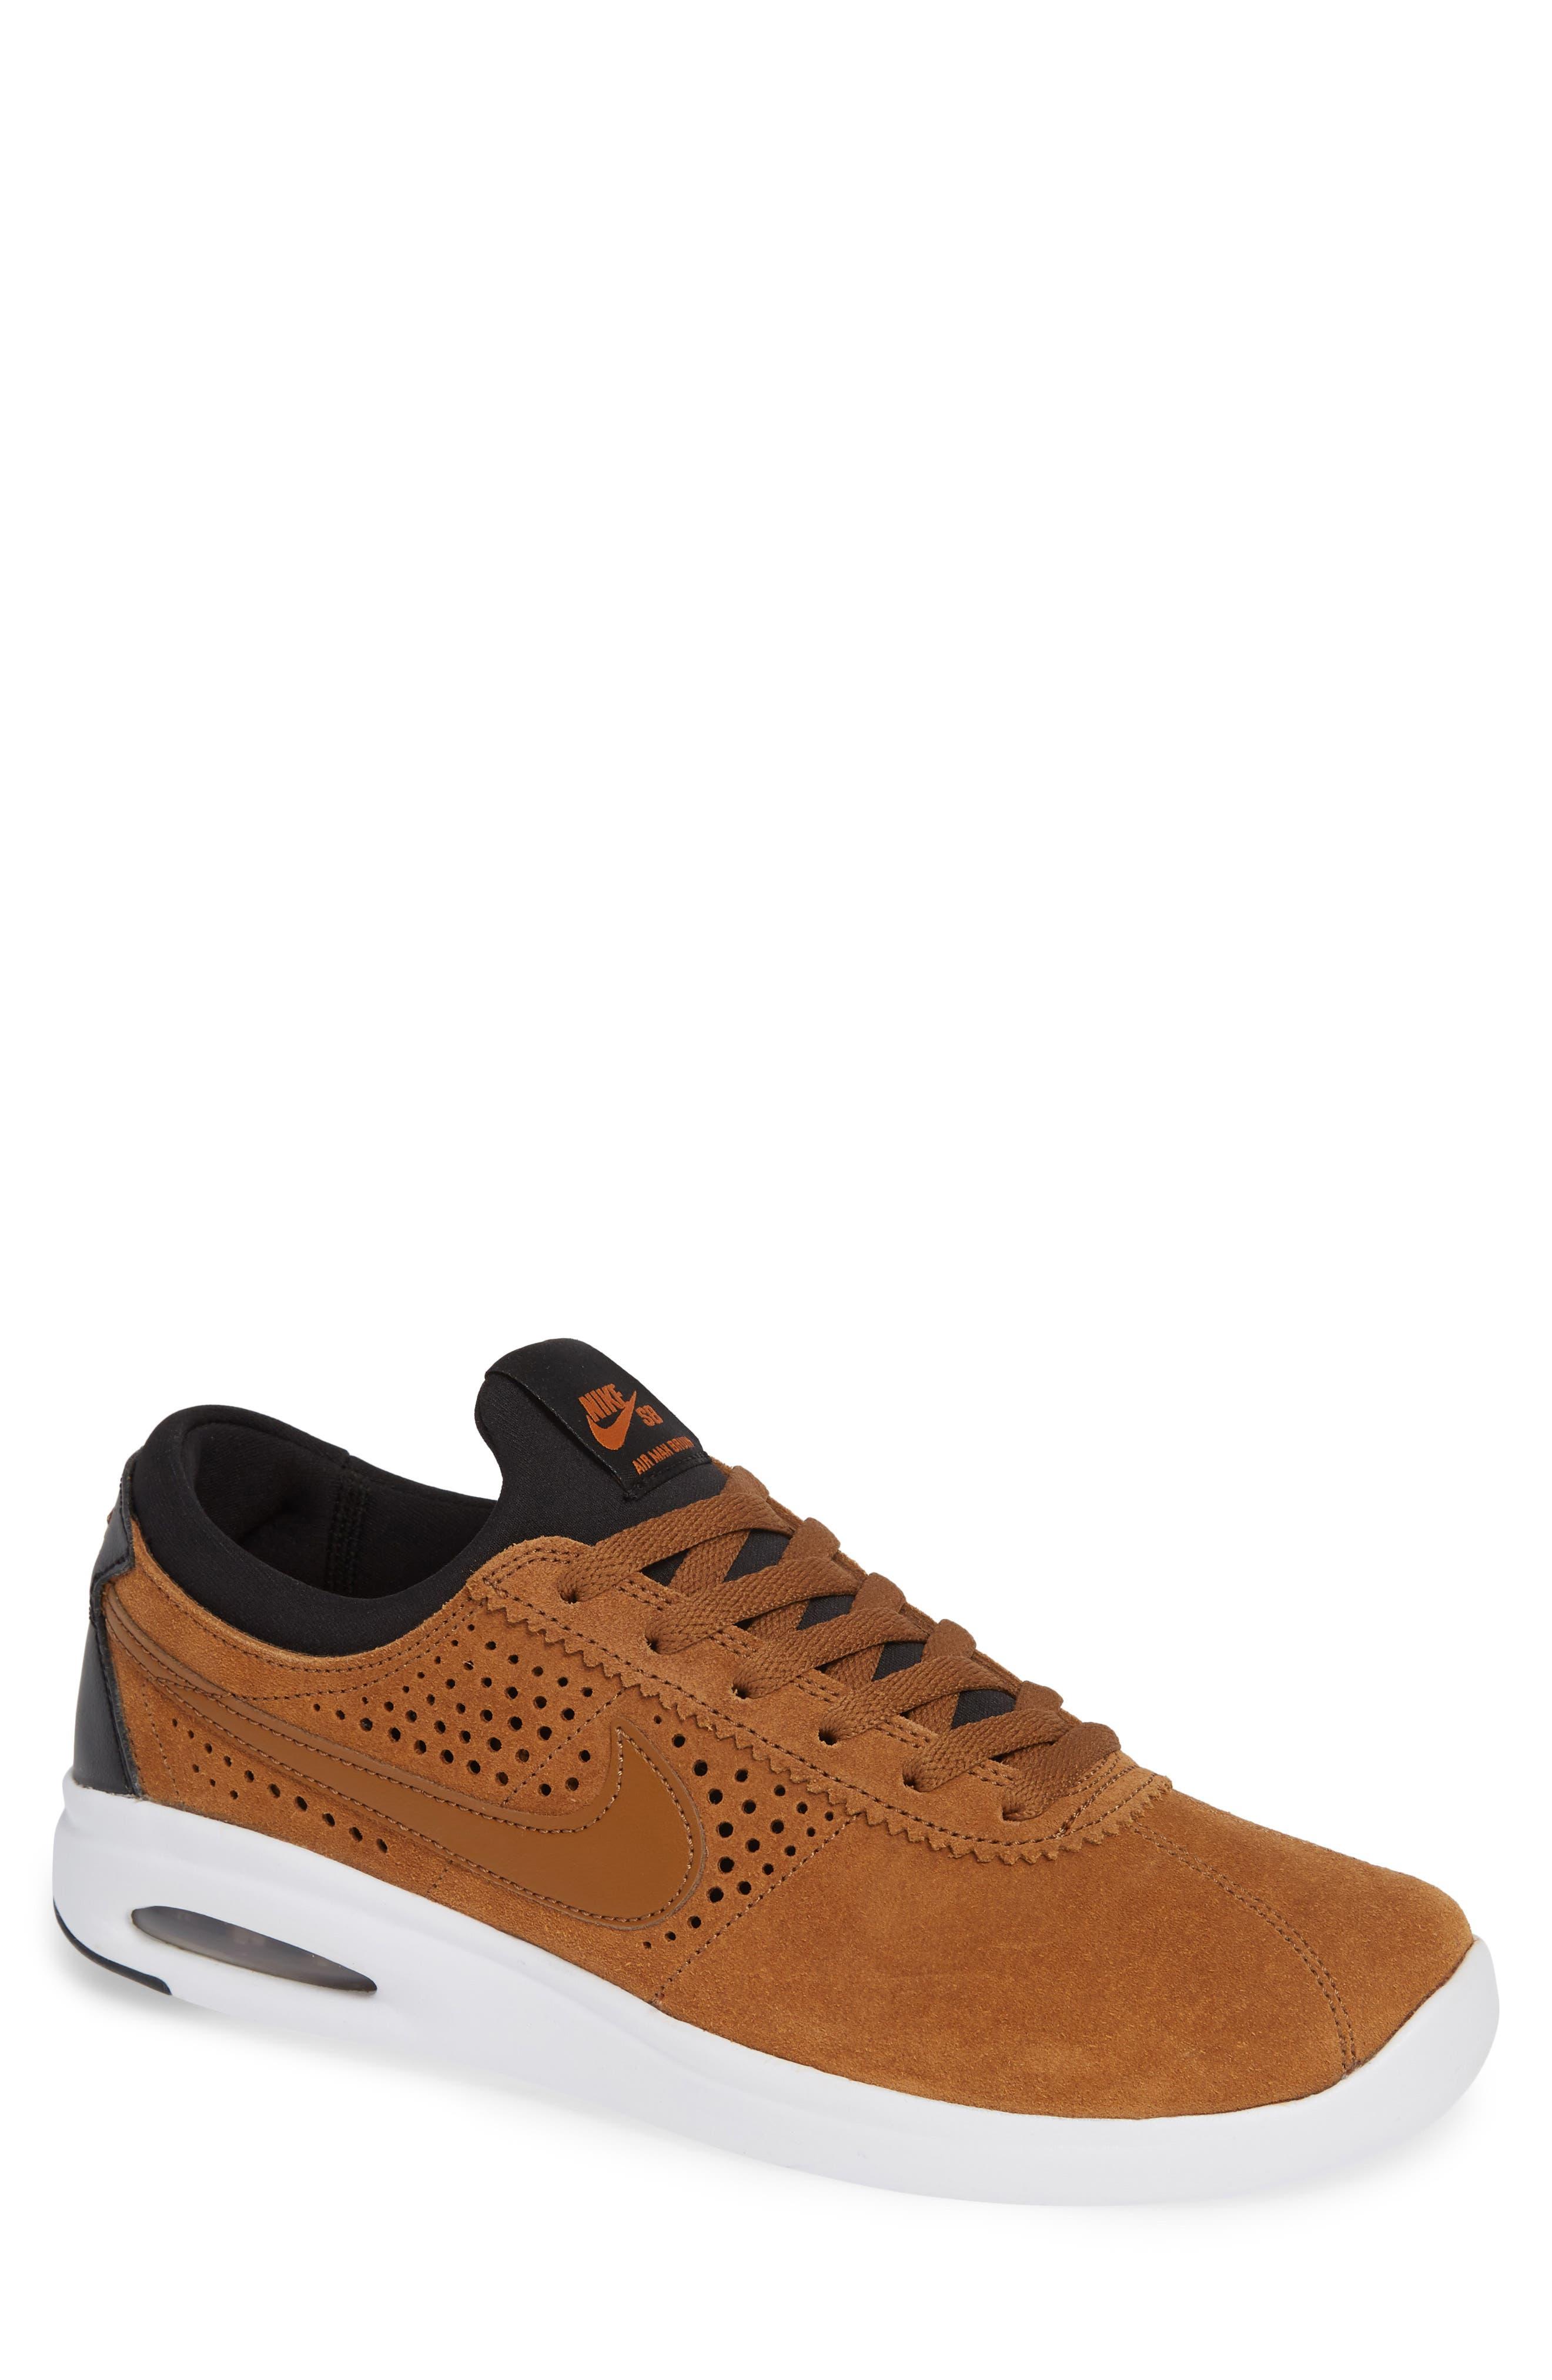 SB Air Max Bruin Vapor Skateboarding Sneaker,                         Main,                         color, BRITISH TAN/ BLACK/ MONARCH